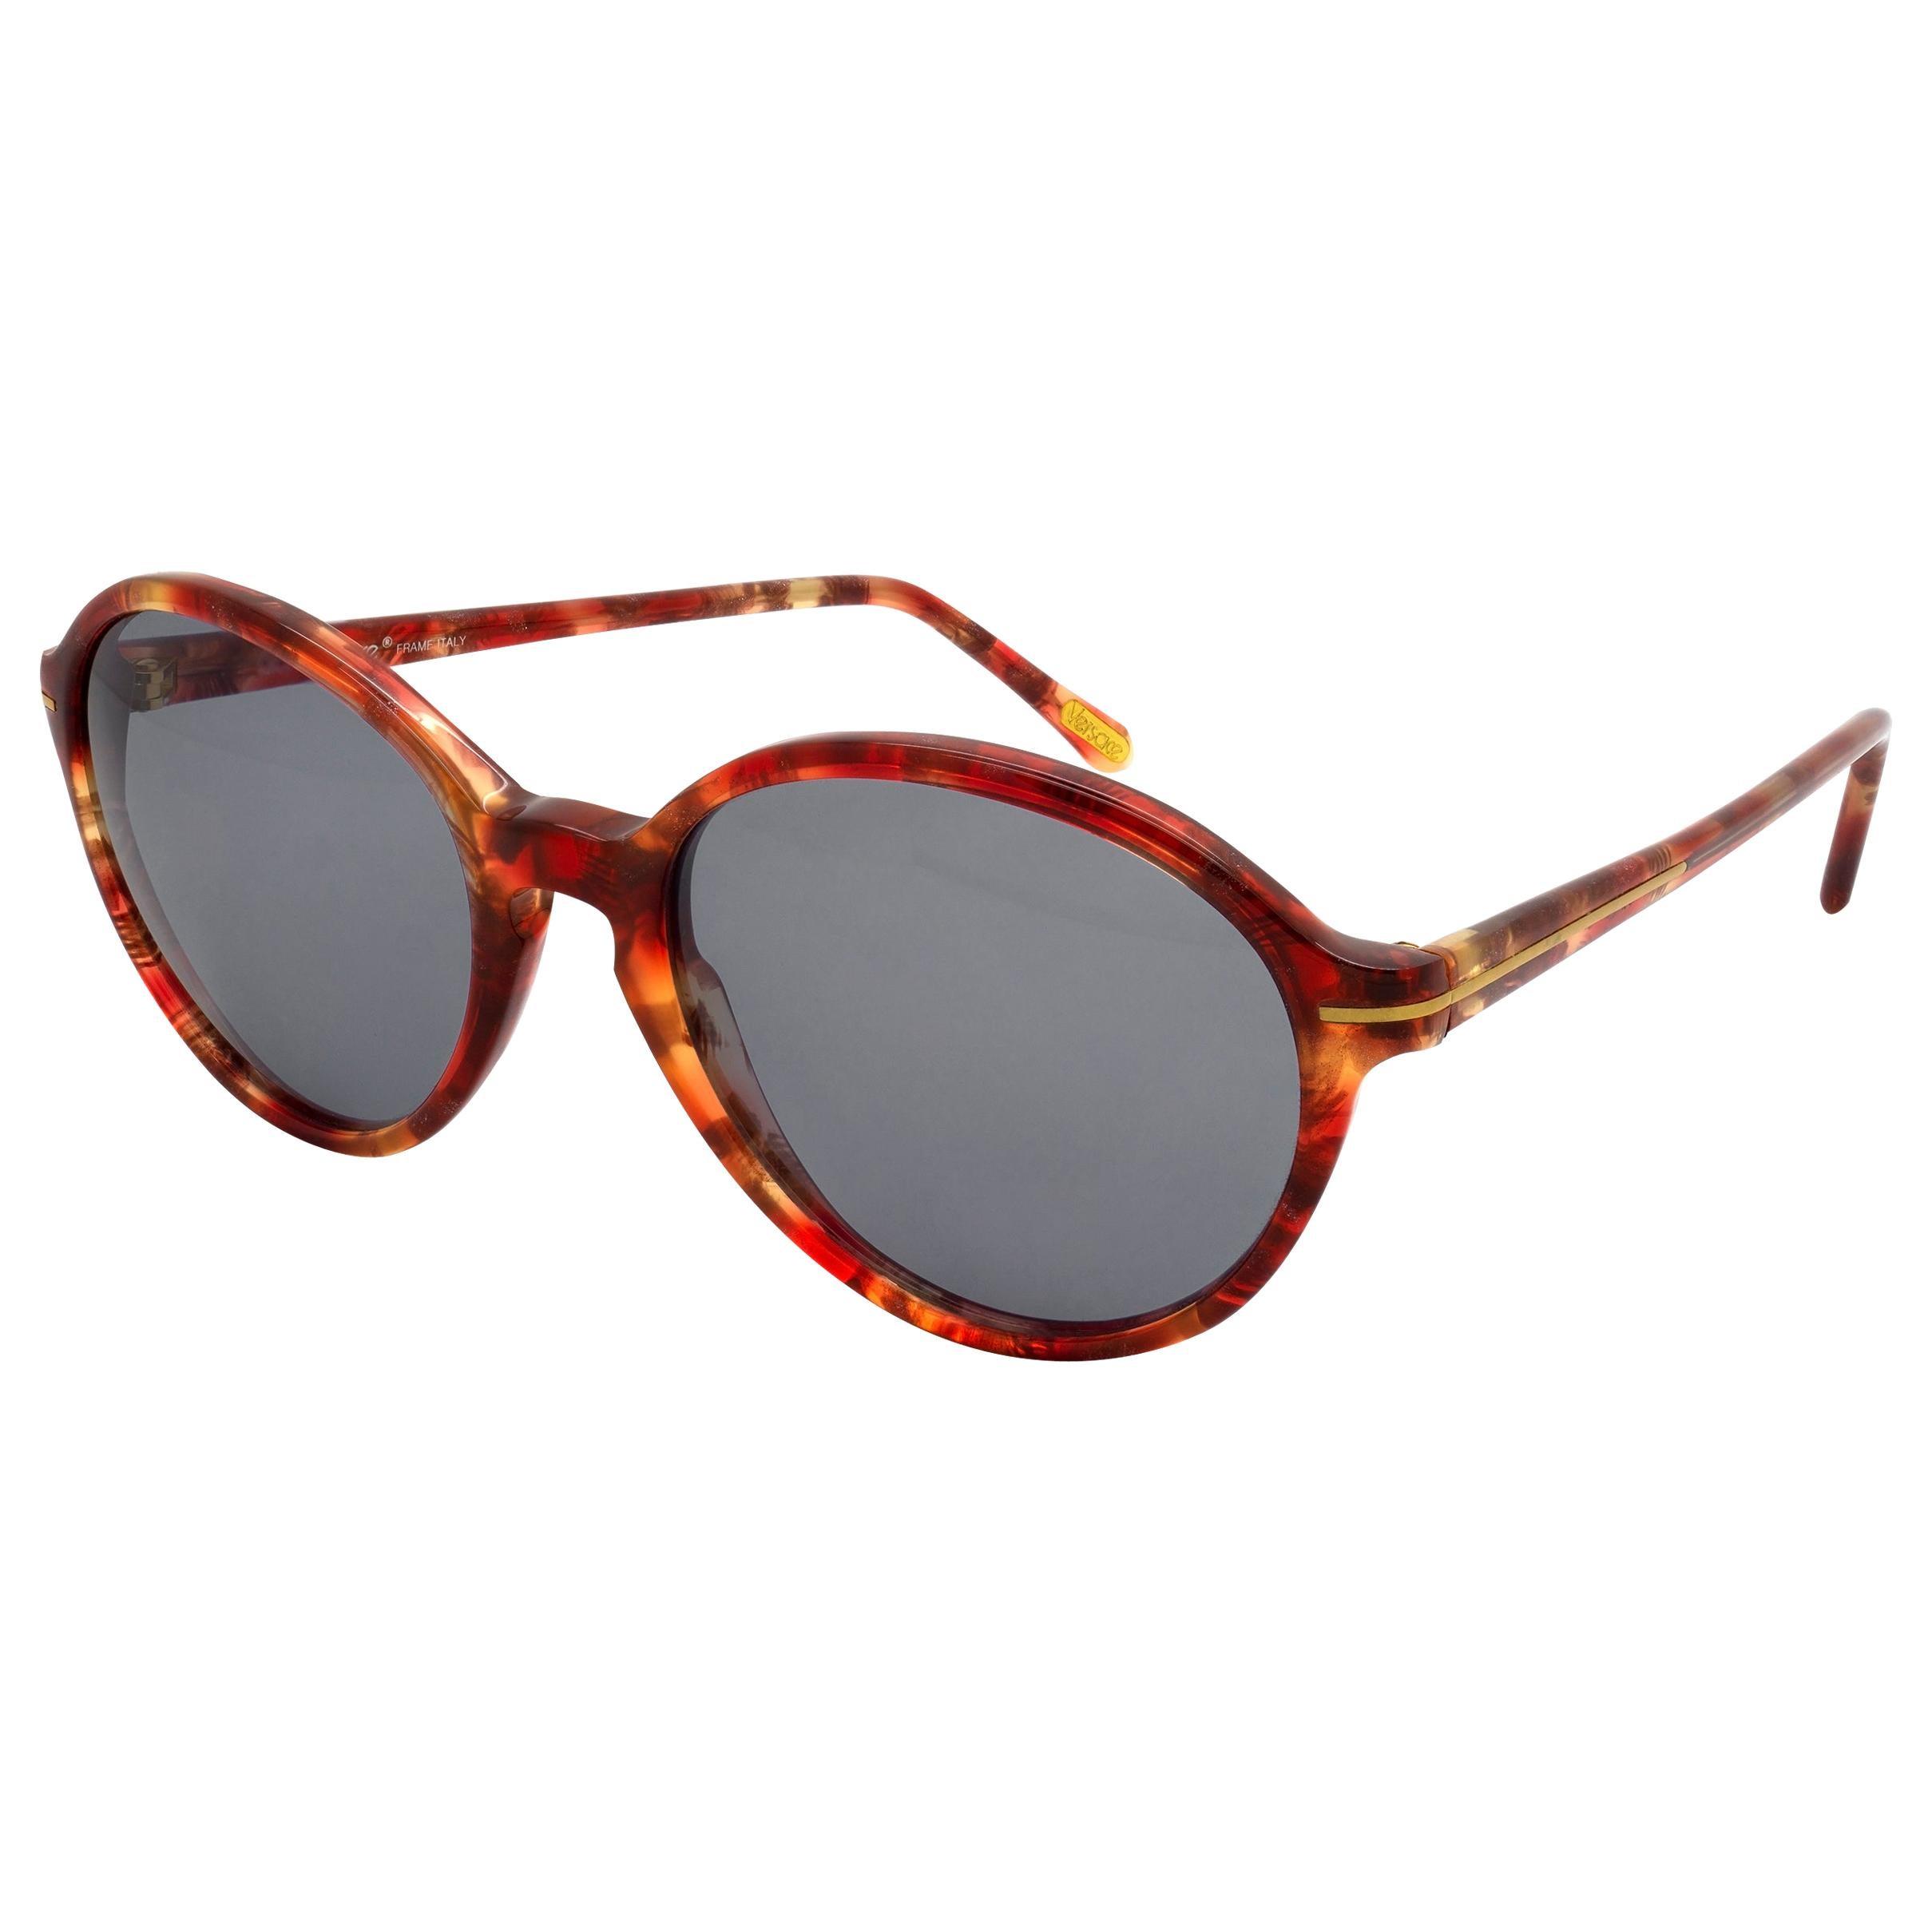 Gianni Versace vintage sunglasses 80s